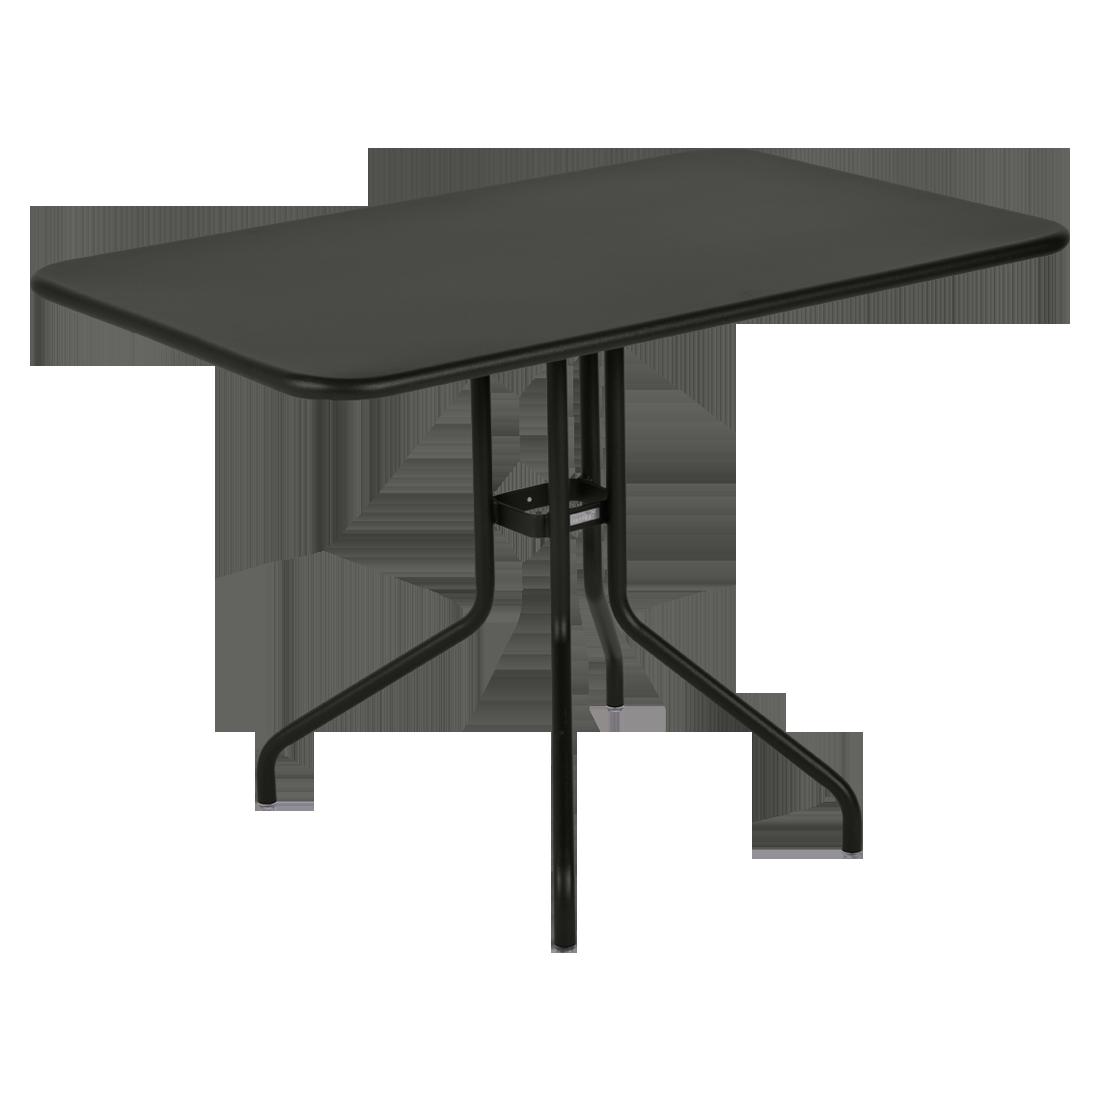 table restaurant, table terrasse, table metal, table pliante metal, mobilier restaurant, table pliante noir